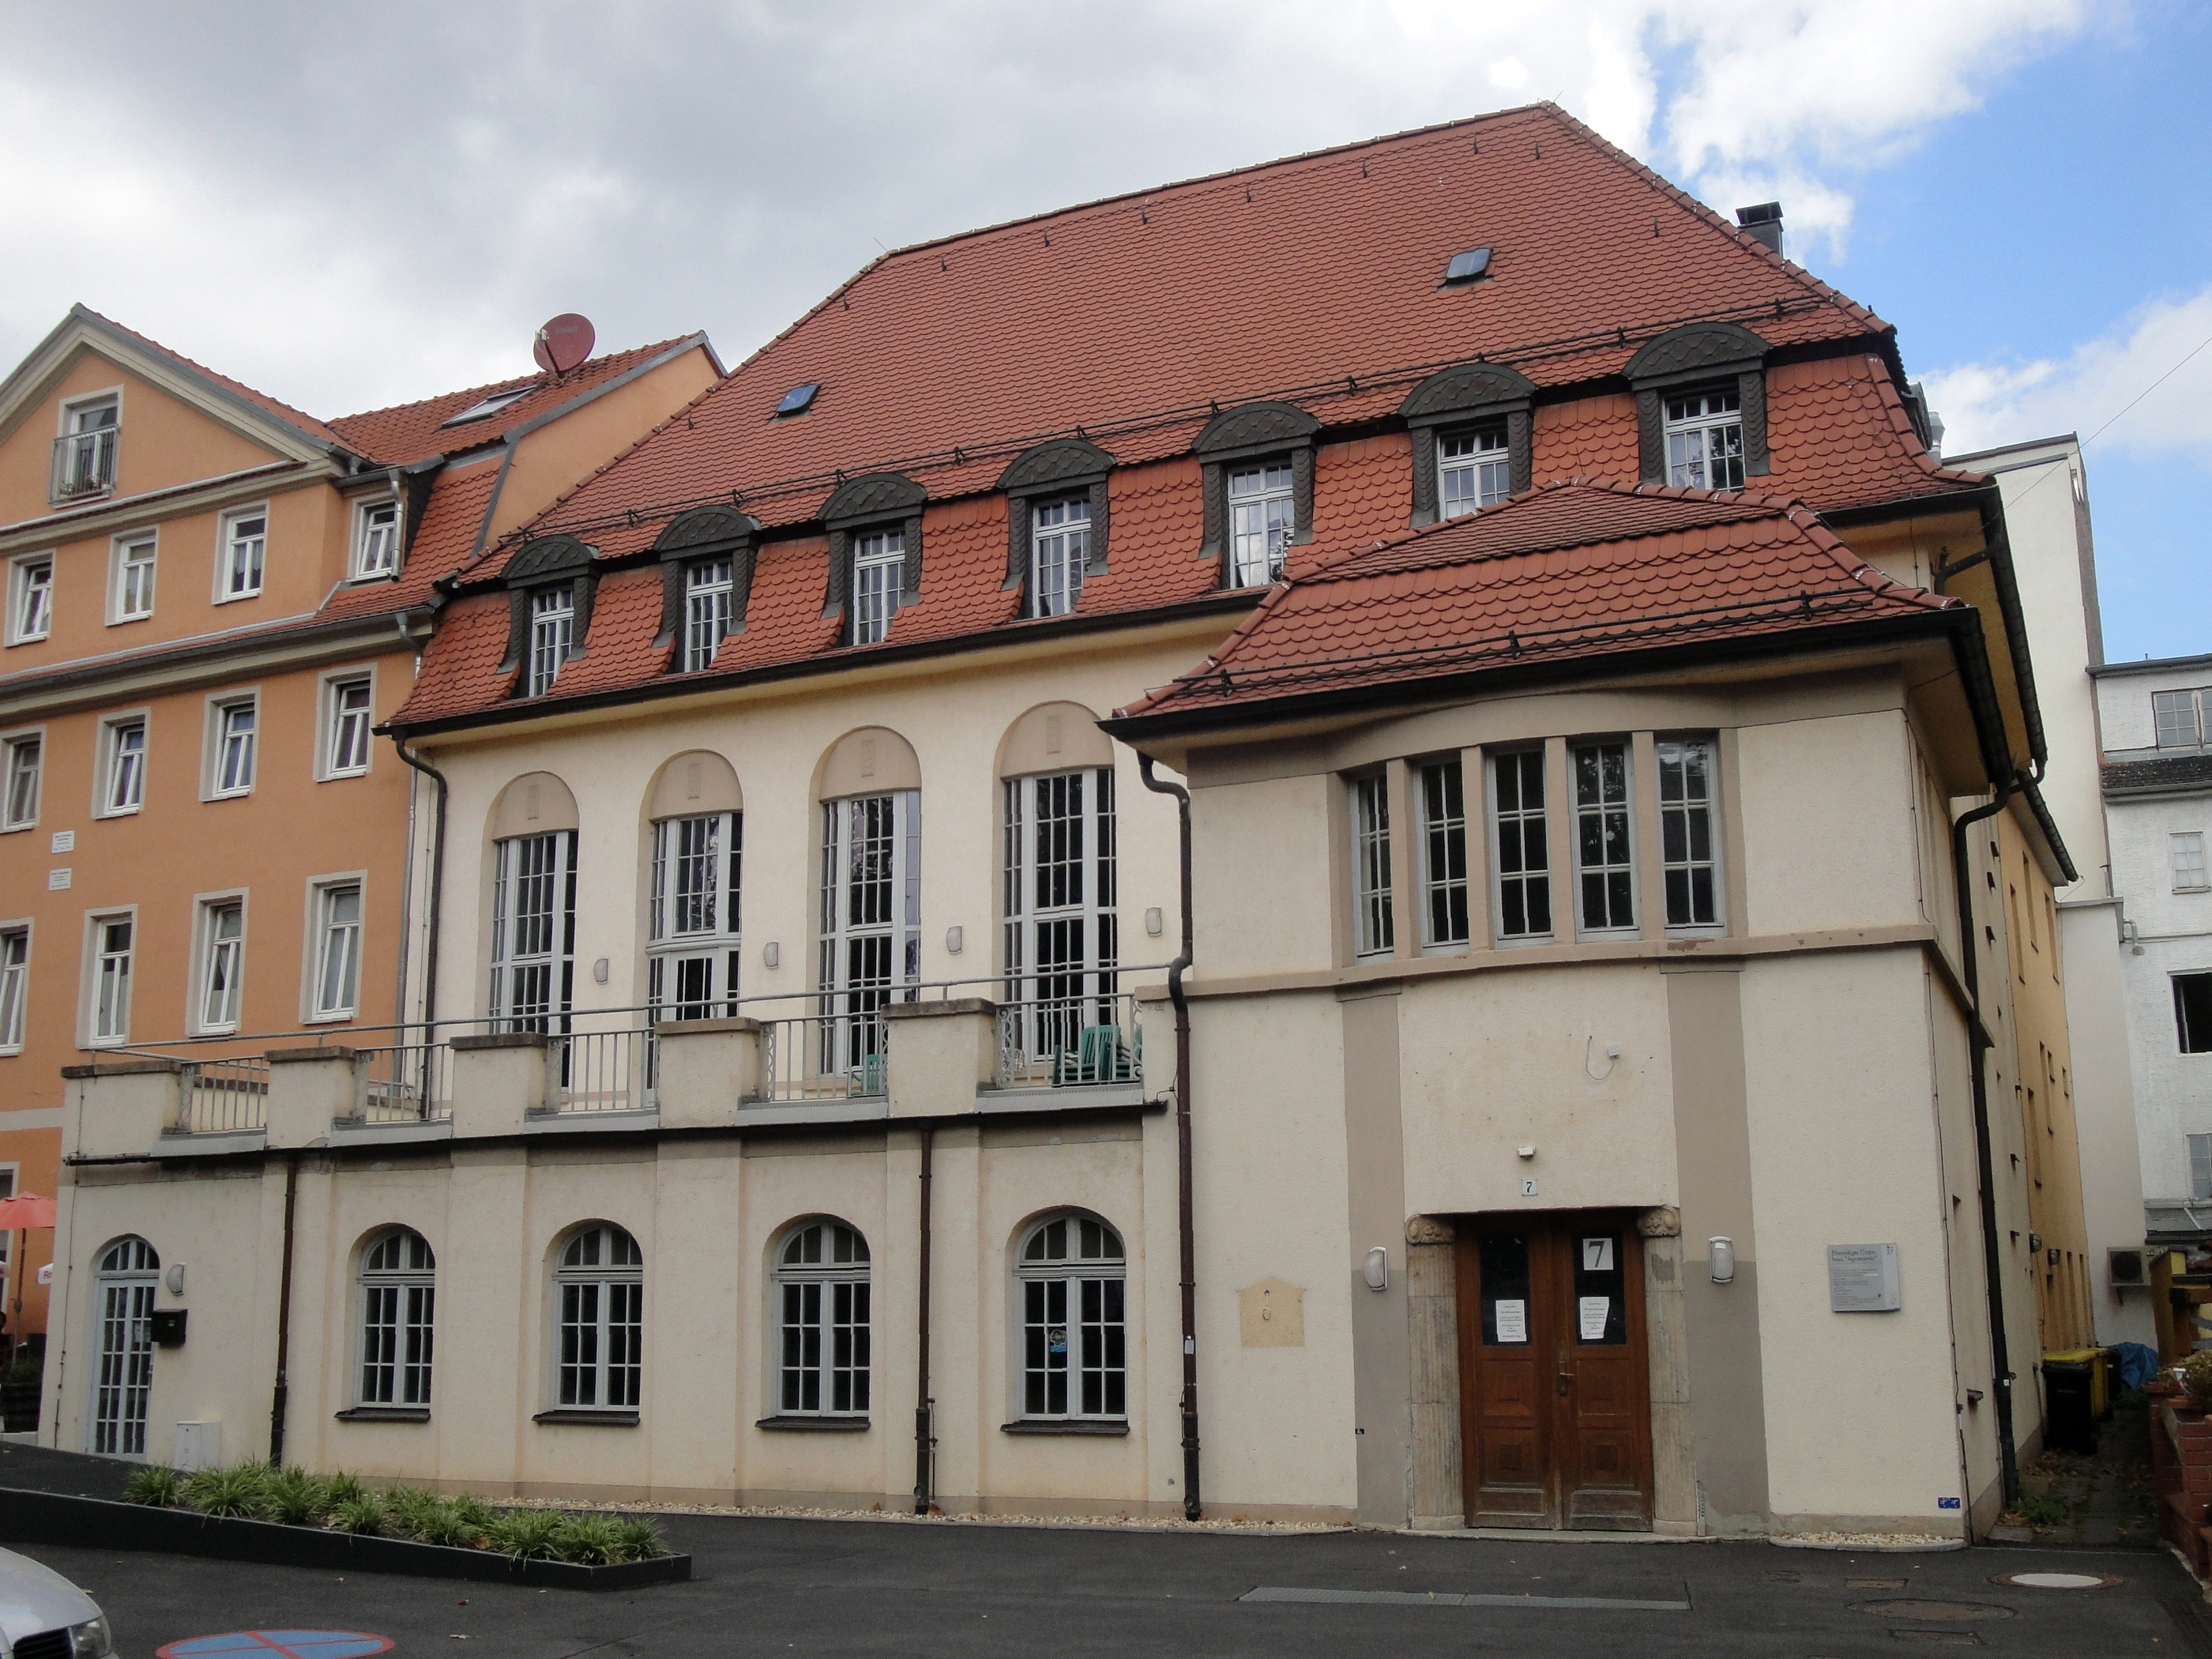 File Jena Ricarda Huch Haus Jpg Wikimedia Commons